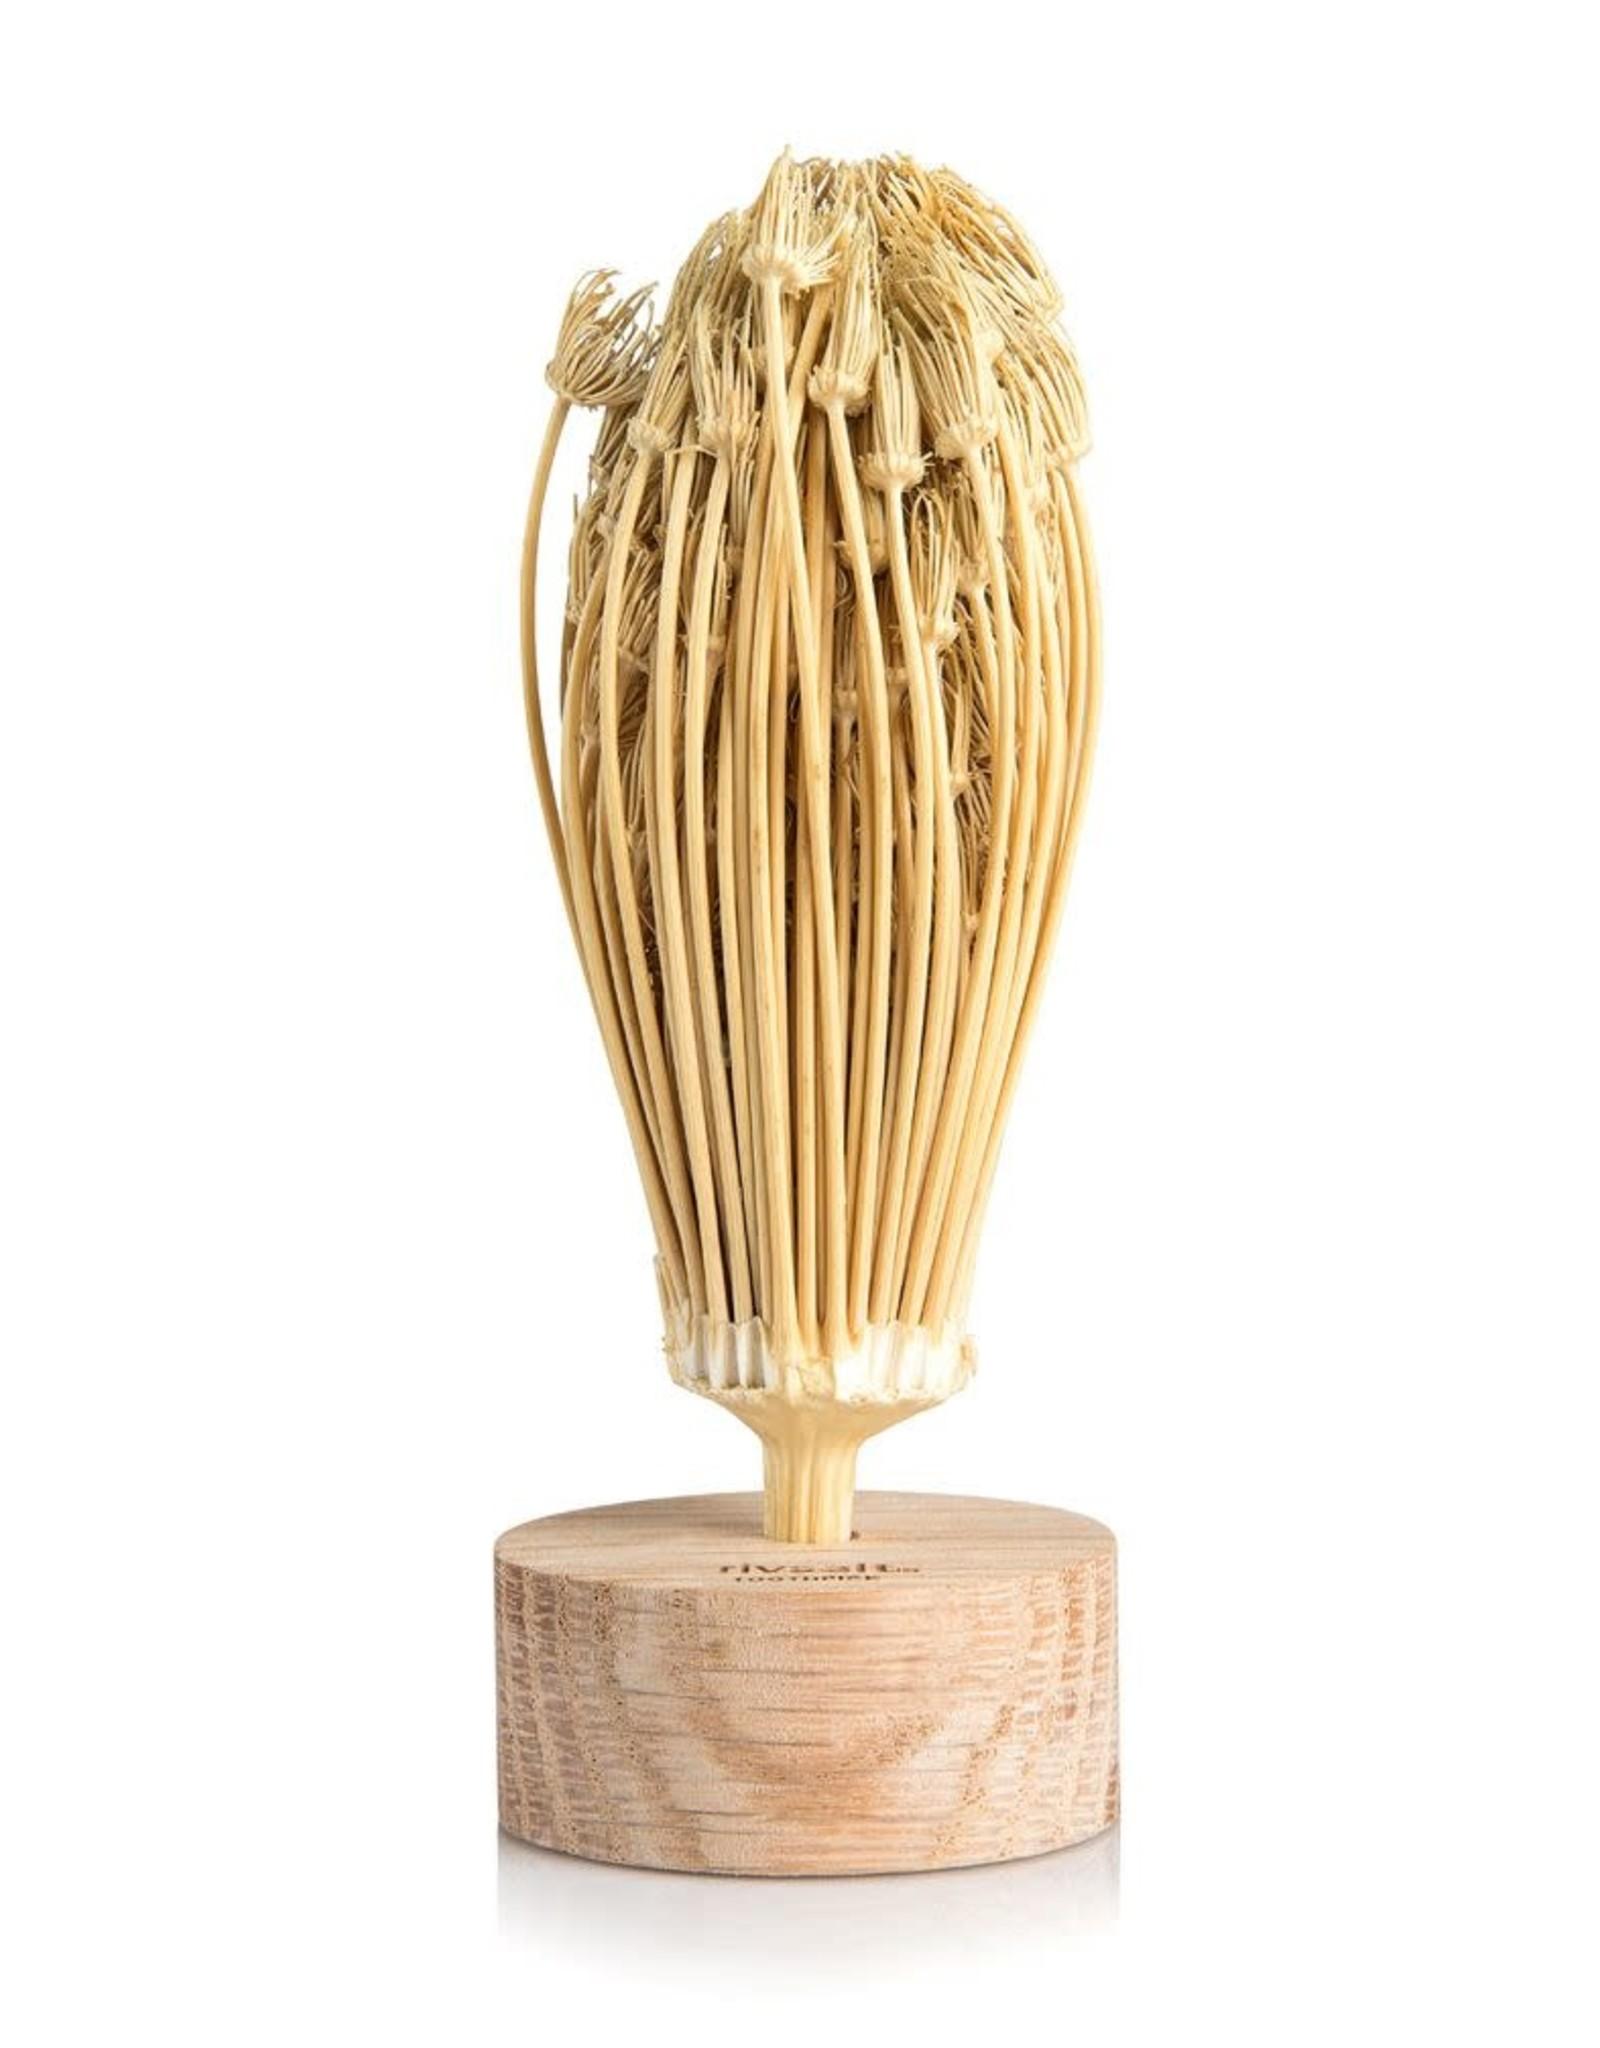 Rivsalt Rivsalt - Toothpick